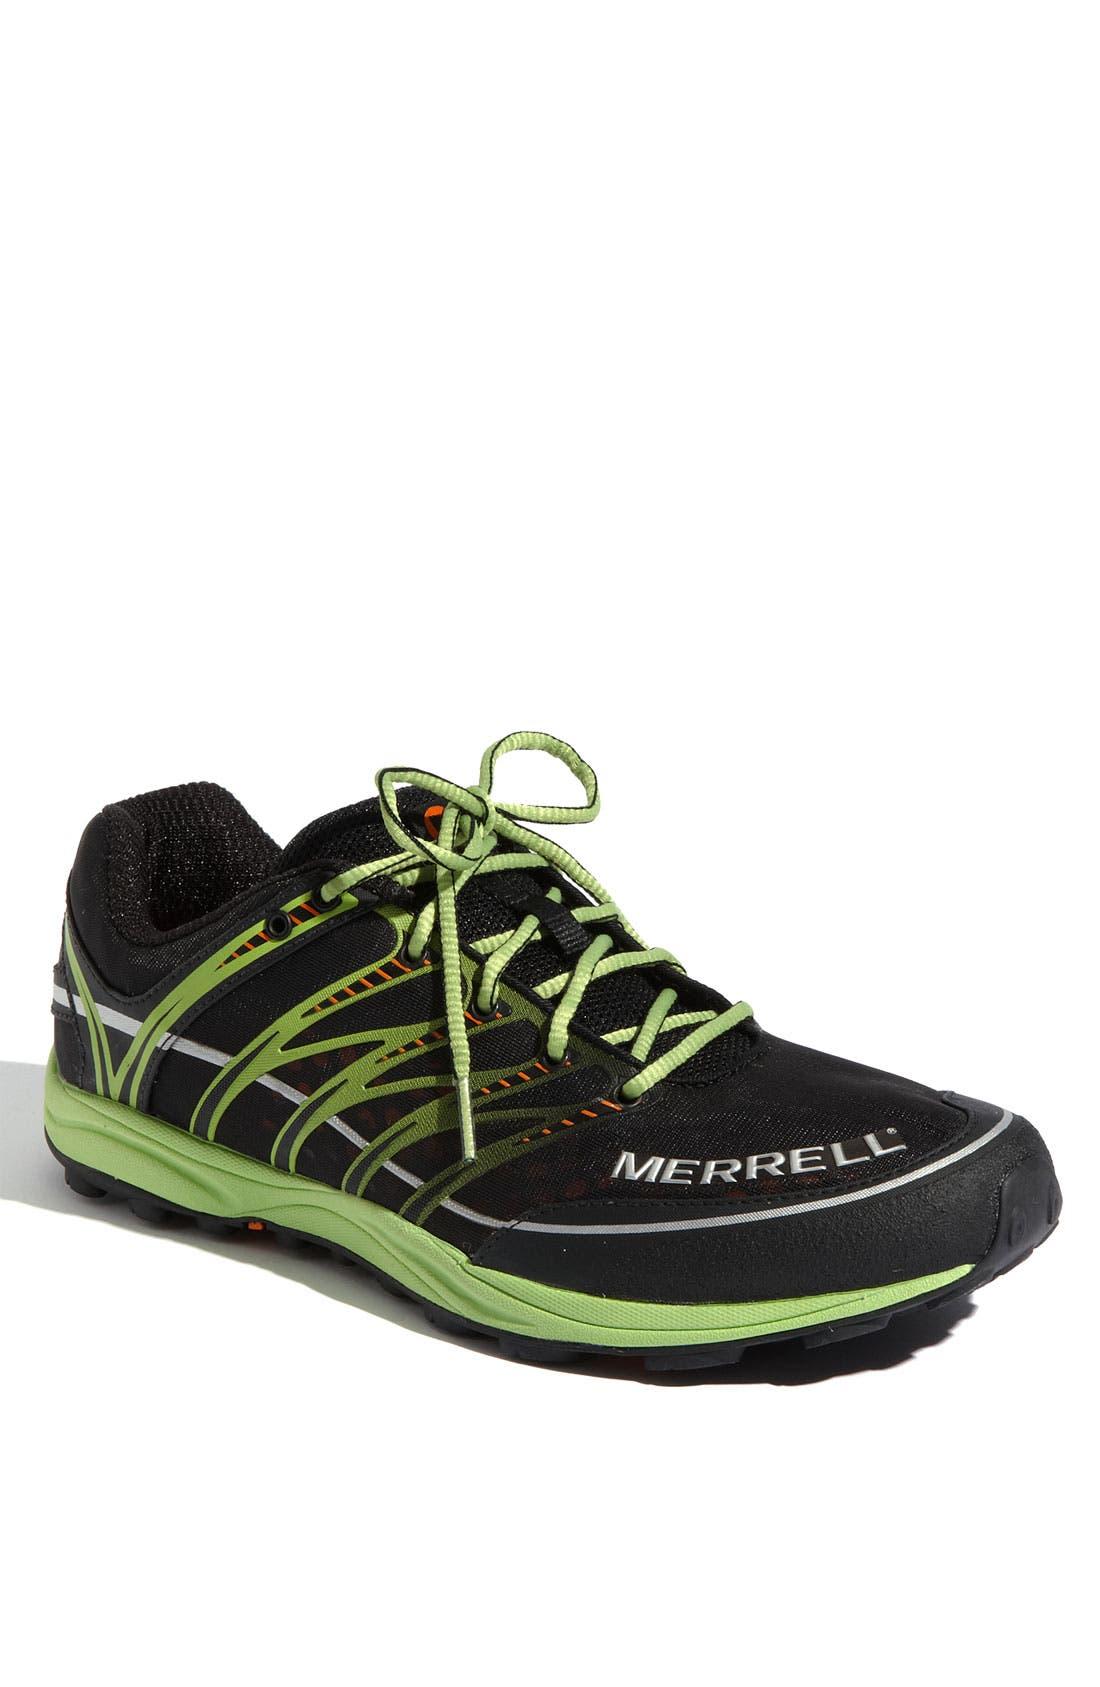 Alternate Image 1 Selected - Merrell 'Mix Master' Running Shoe